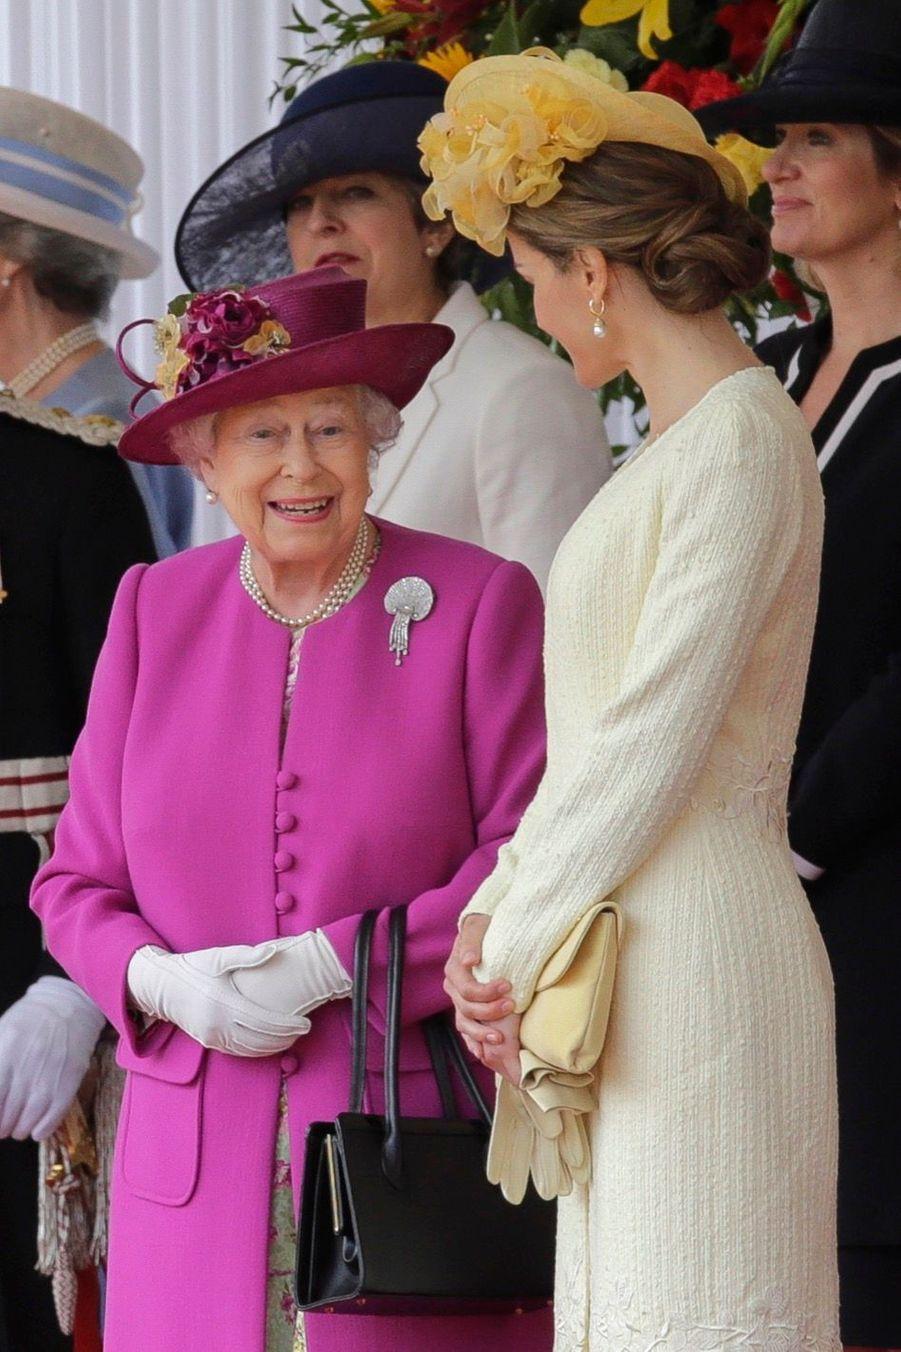 Letizia Et Felipe En Visite Chez La Reine Elizabeth II 23